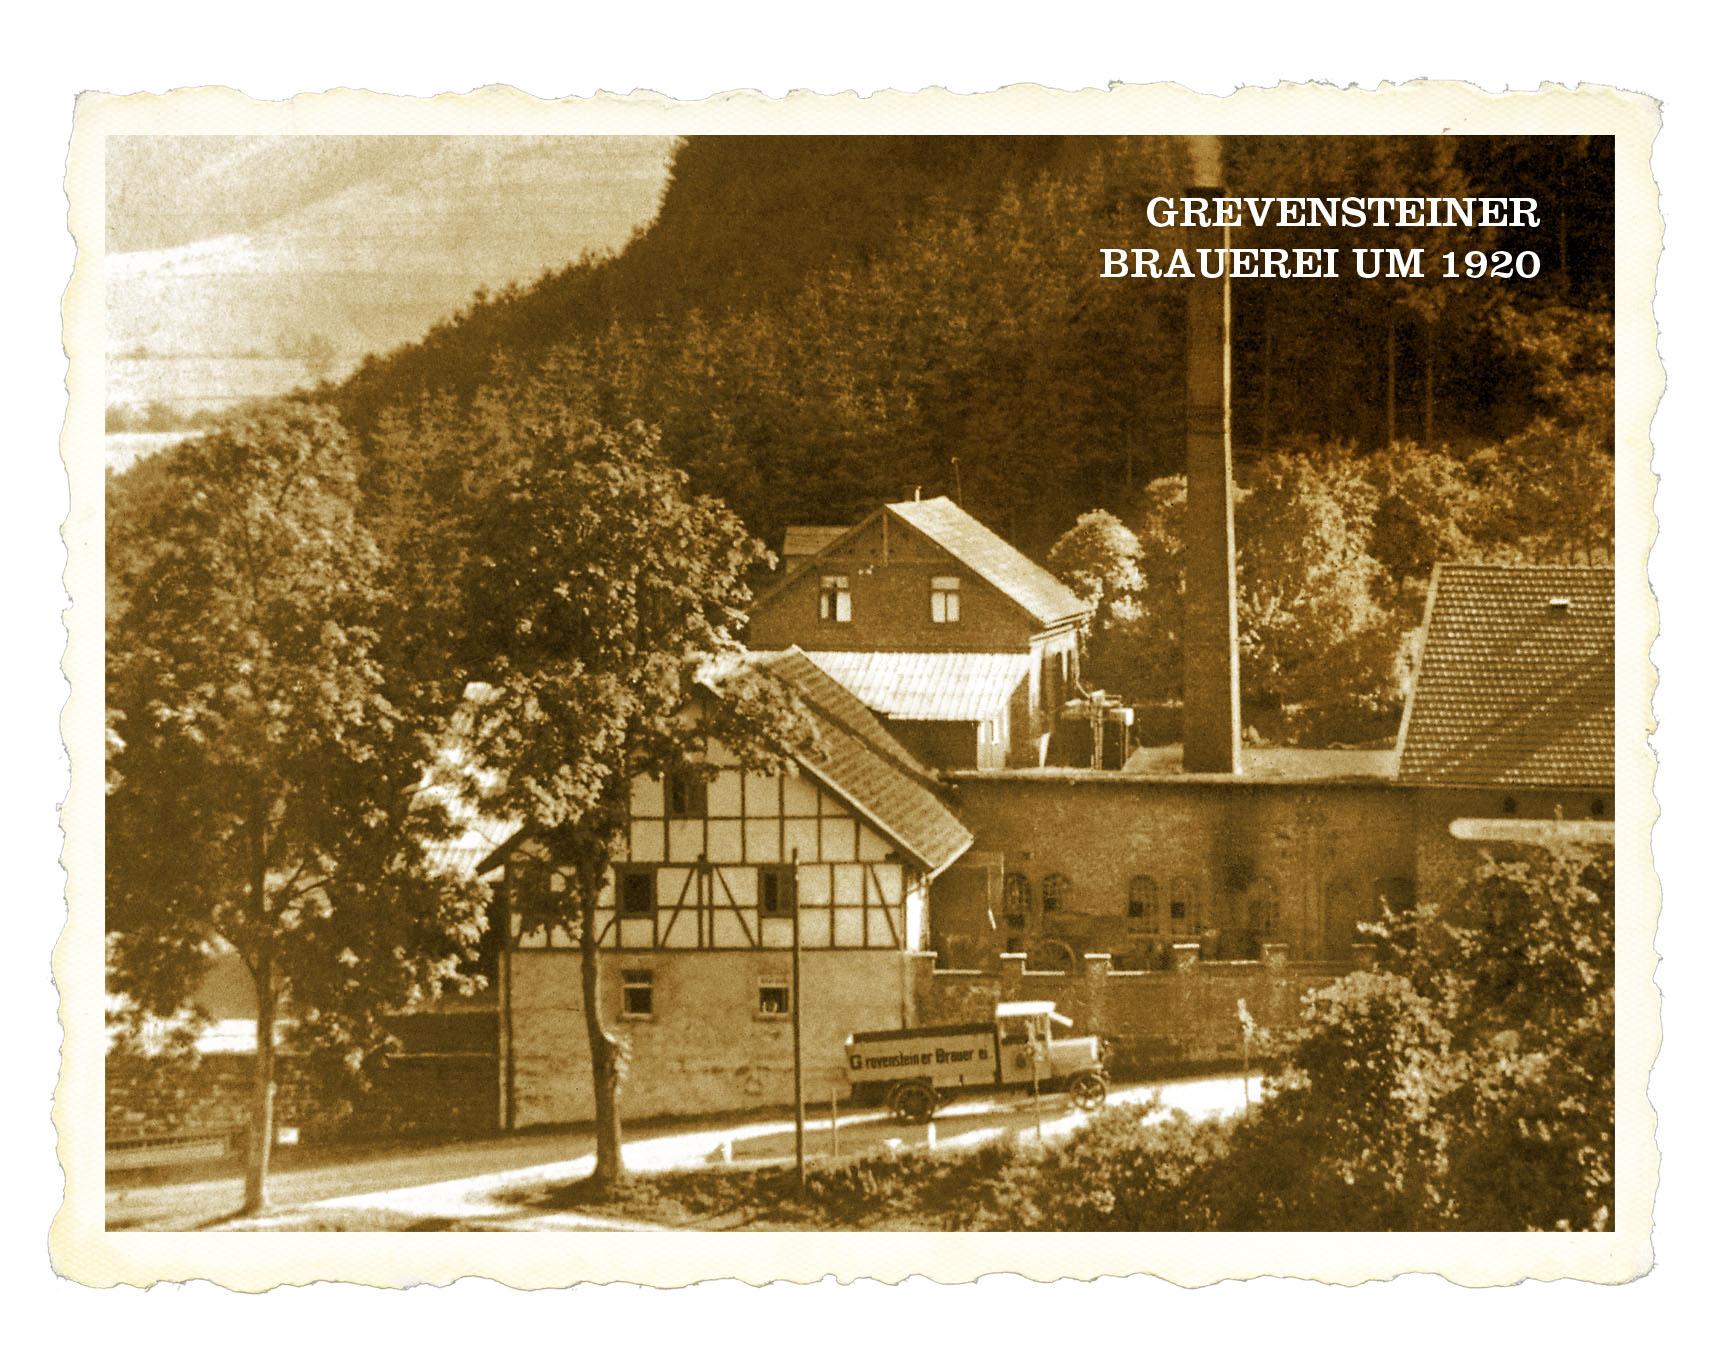 Postkarte.jpg